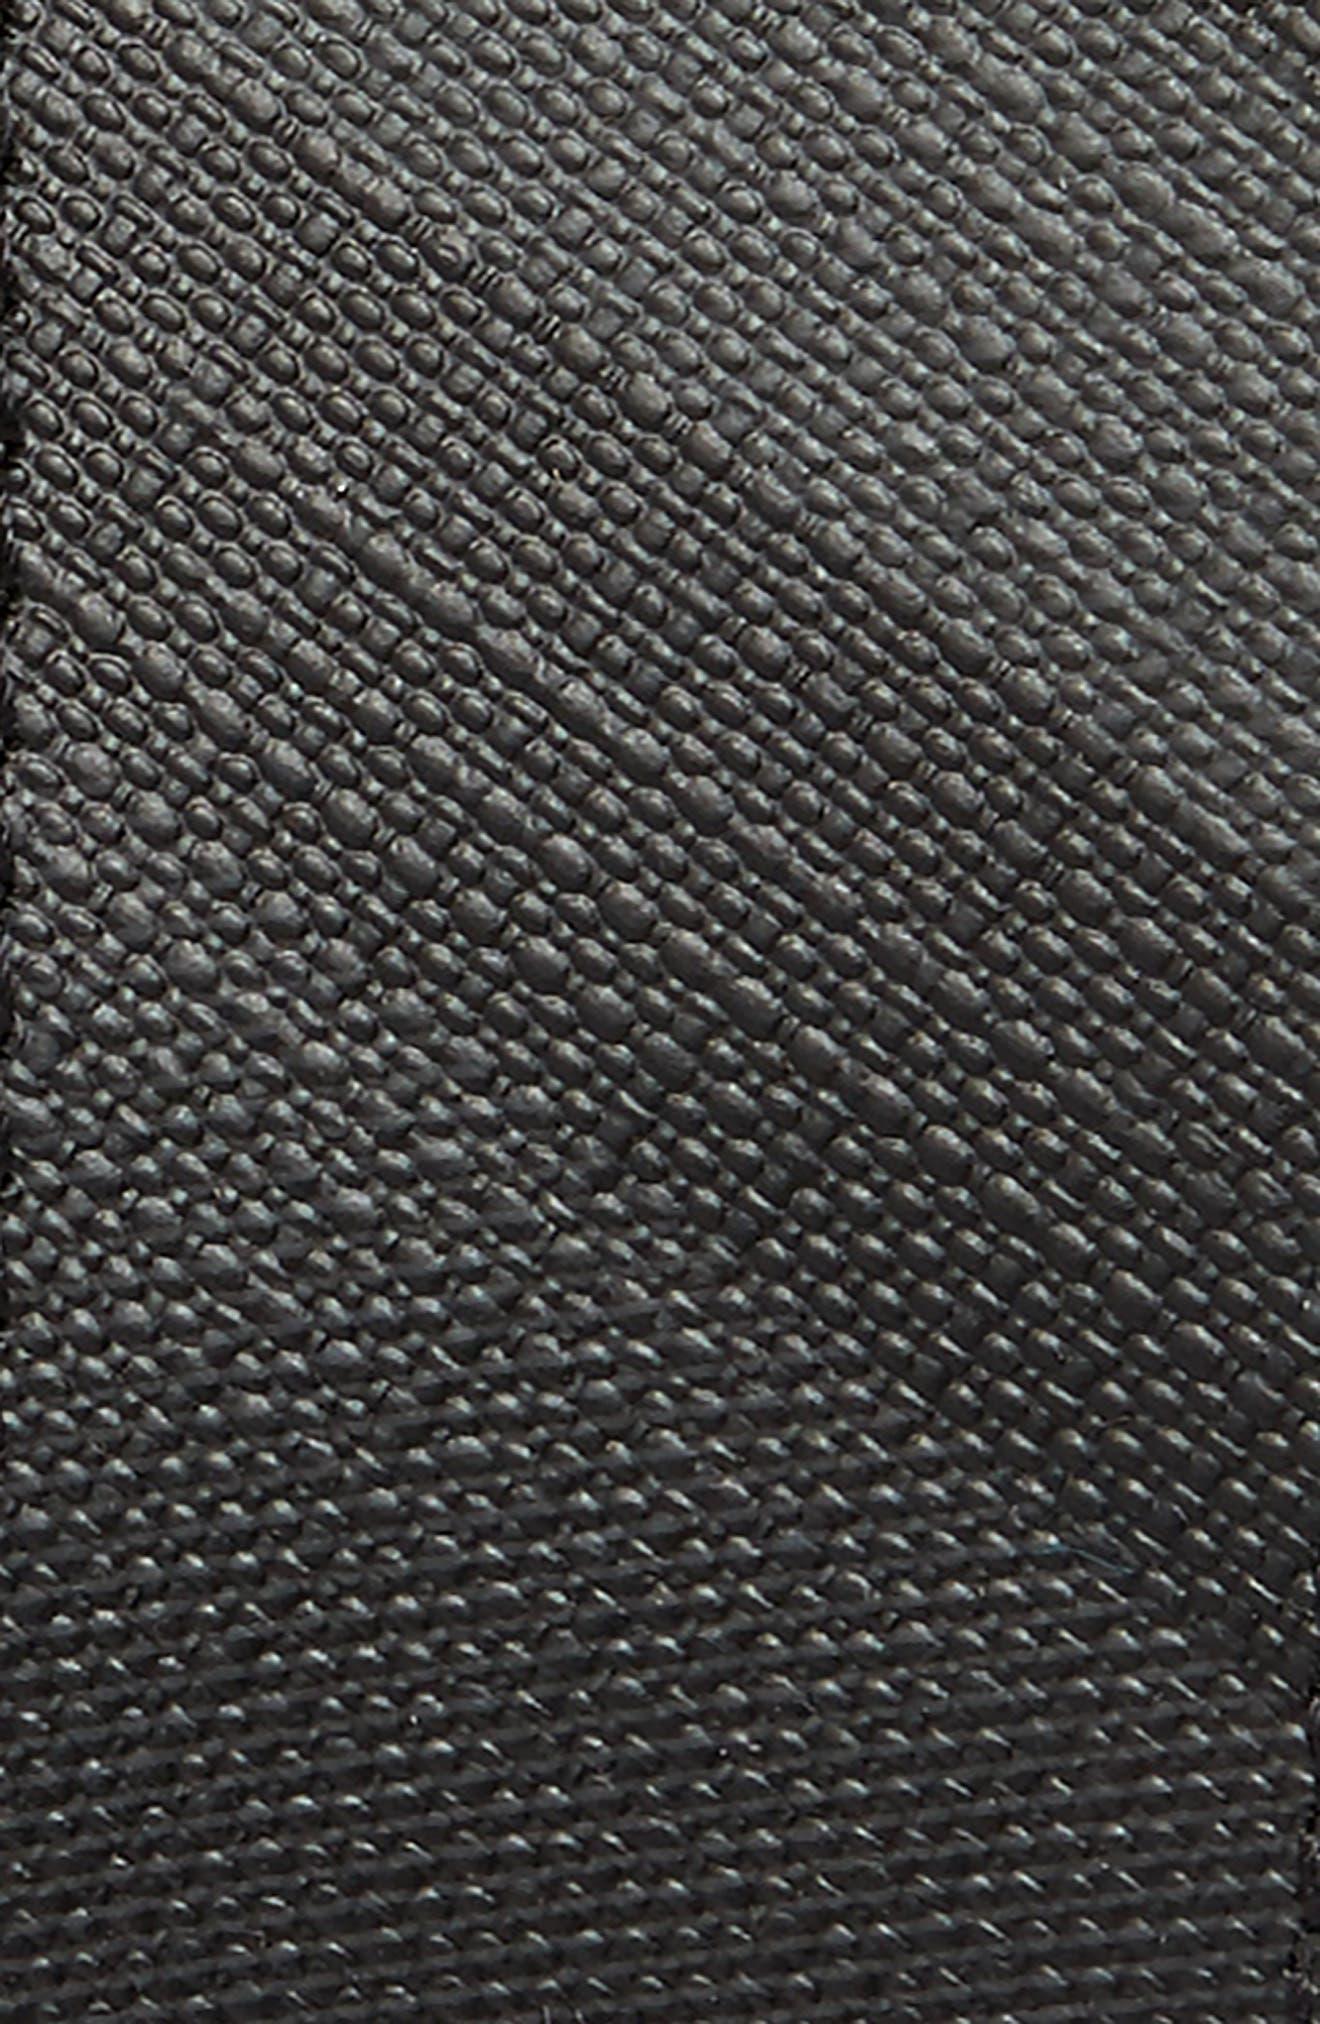 London Check Belt,                             Alternate thumbnail 2, color,                             Charcoal/ Black